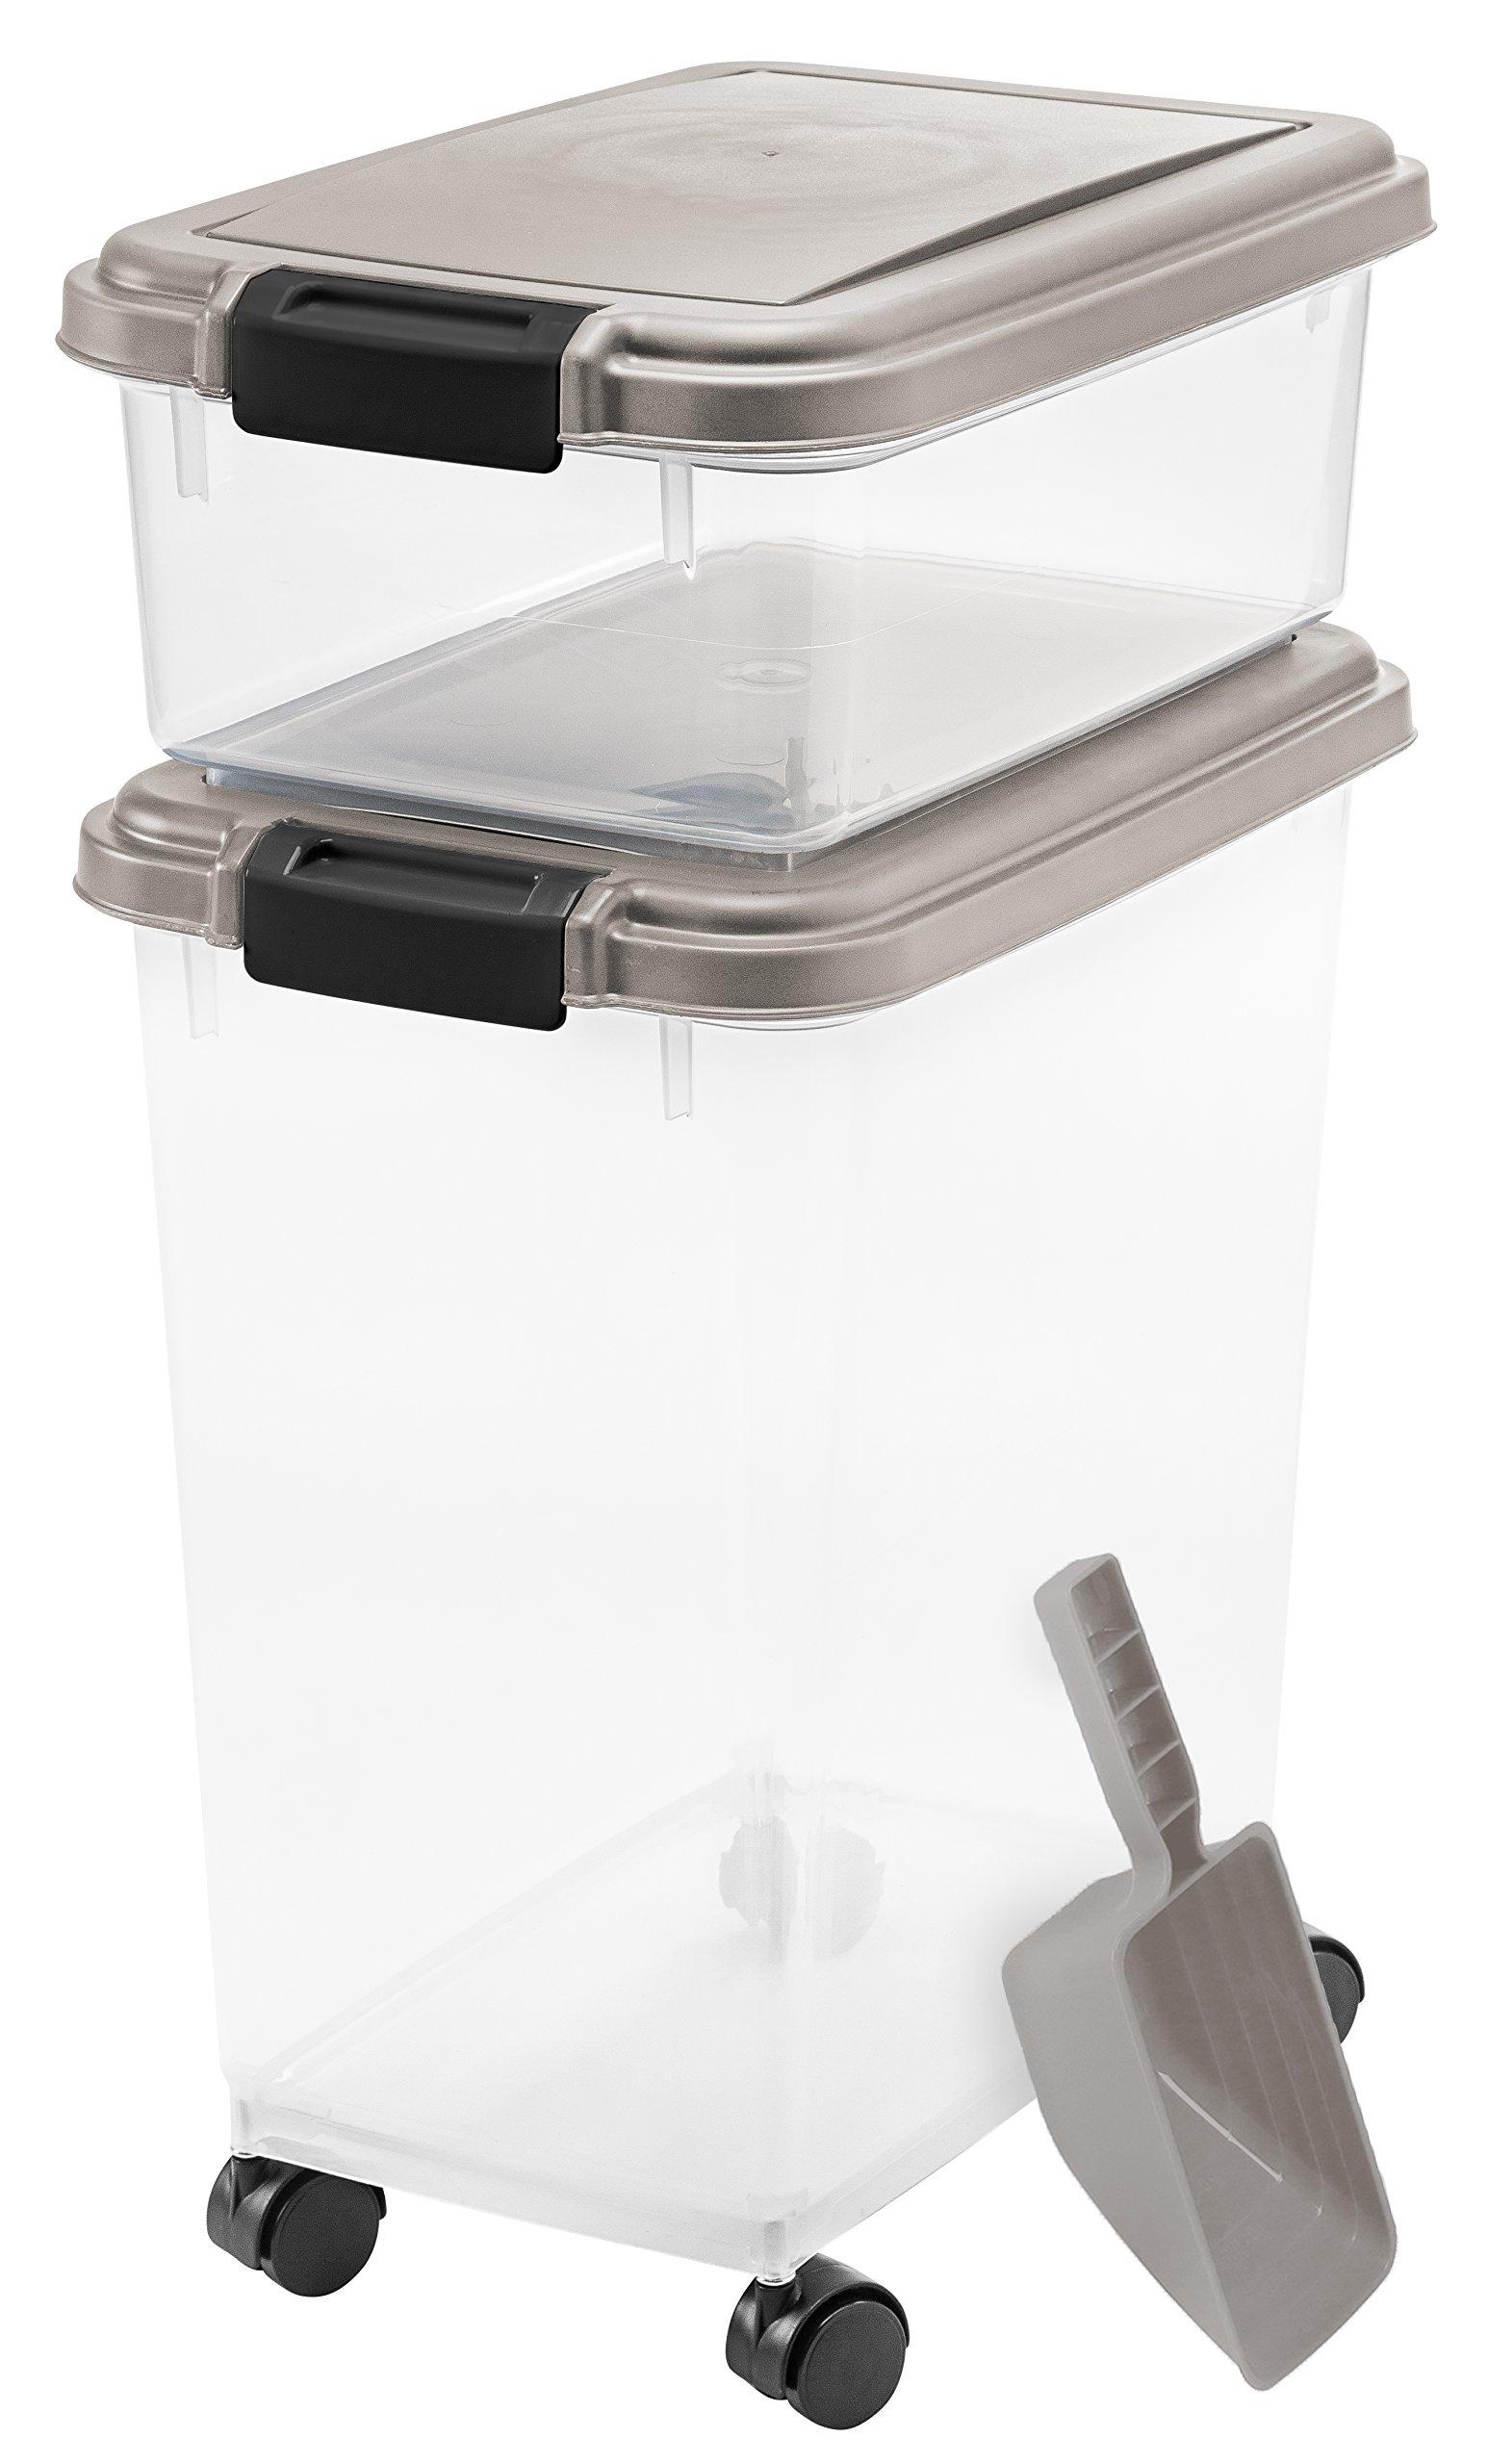 IRIS USA, MP-8/MP-1/SCP-2, 3- Piece Airtight Pet Food Storage Container Combo, Chrome, 1 Pack by IRIS USA, Inc.